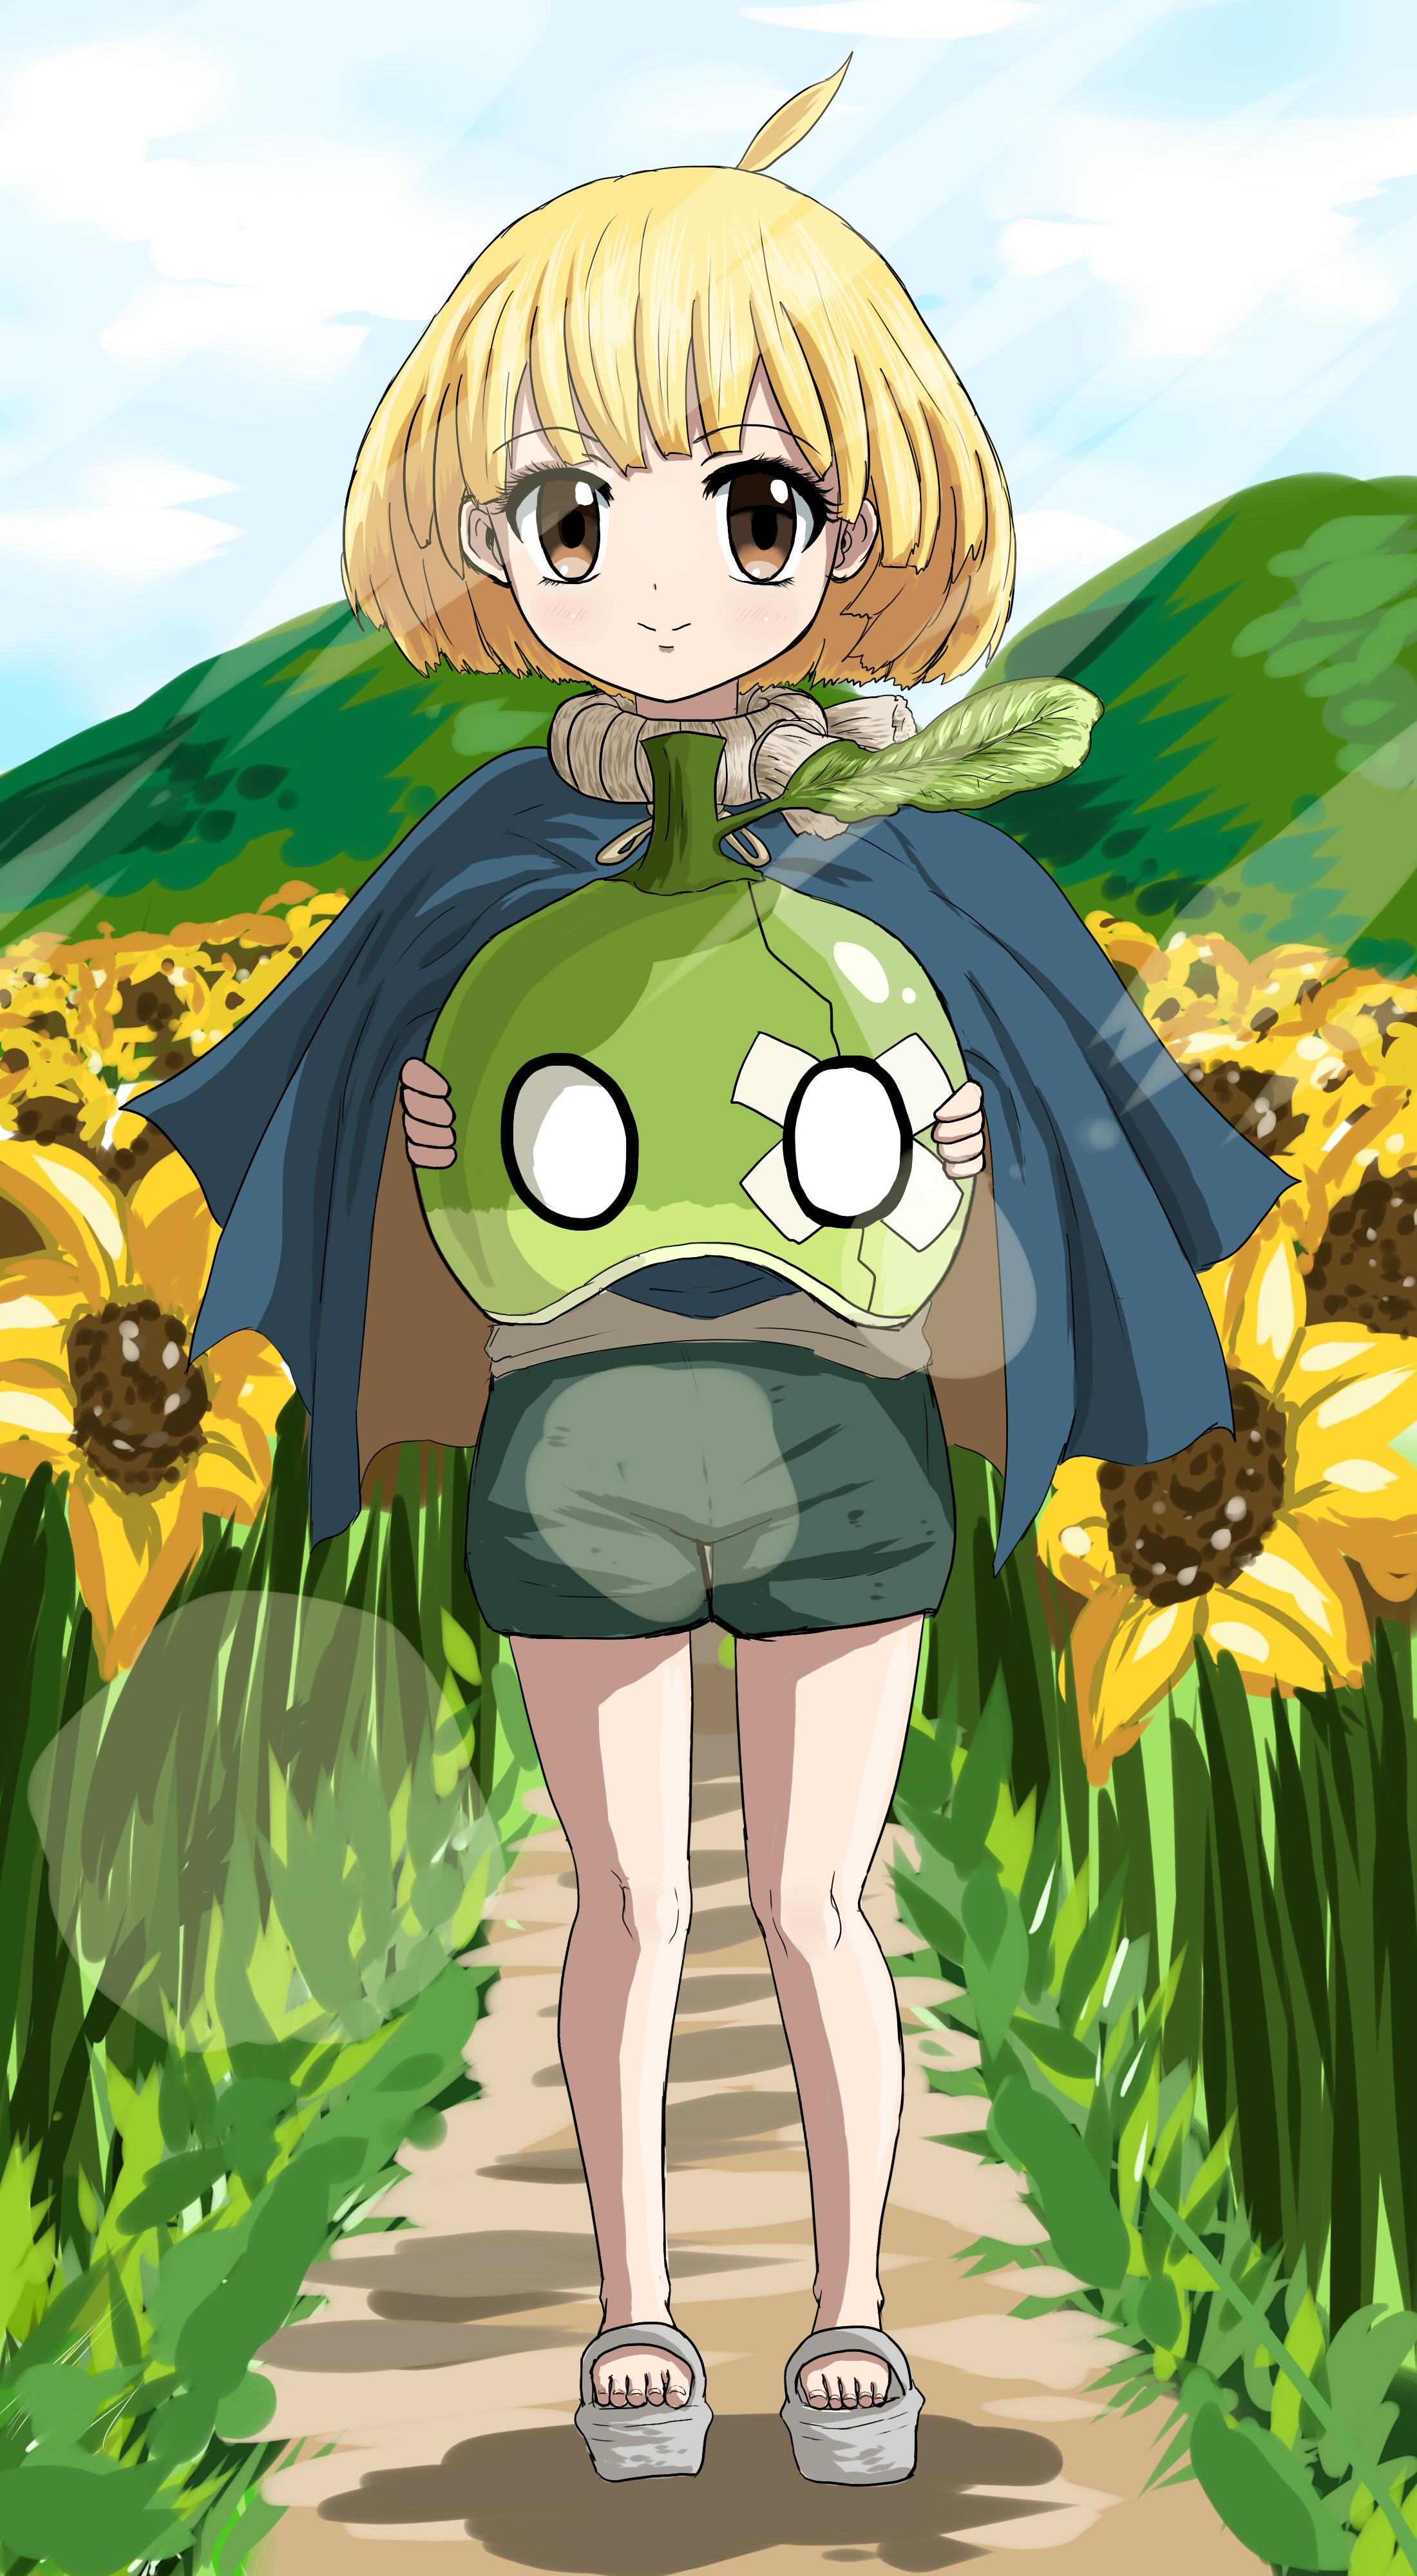 Suika (Dr. STONE) Image #2722230 - Zerochan Anime Image Board